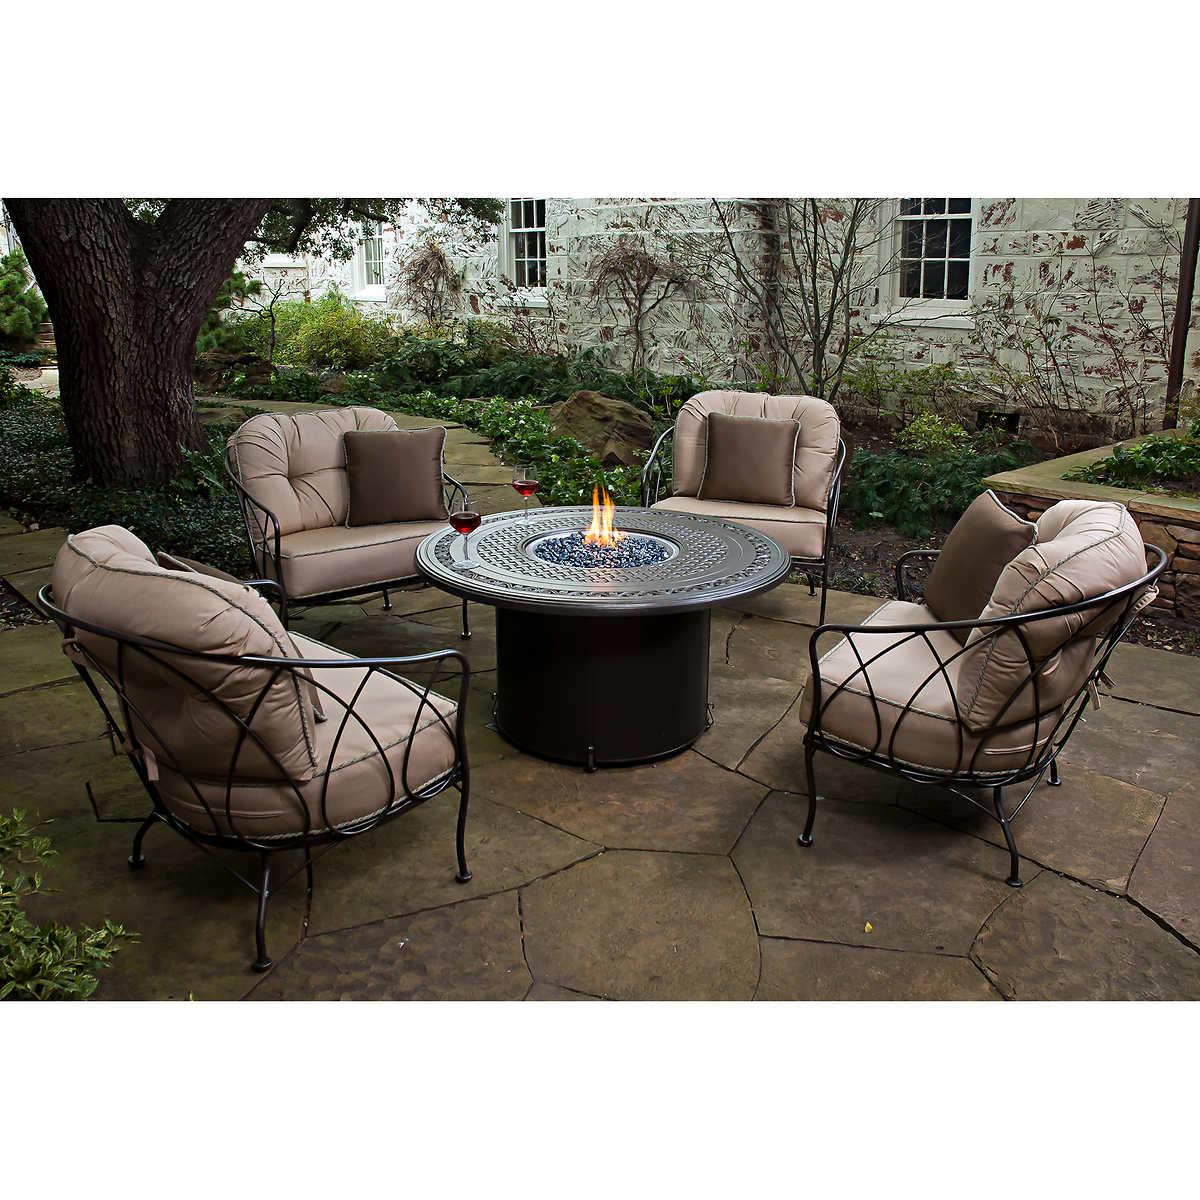 Patio furniture sets costco - Medina 5 Piece Fire Chat Set